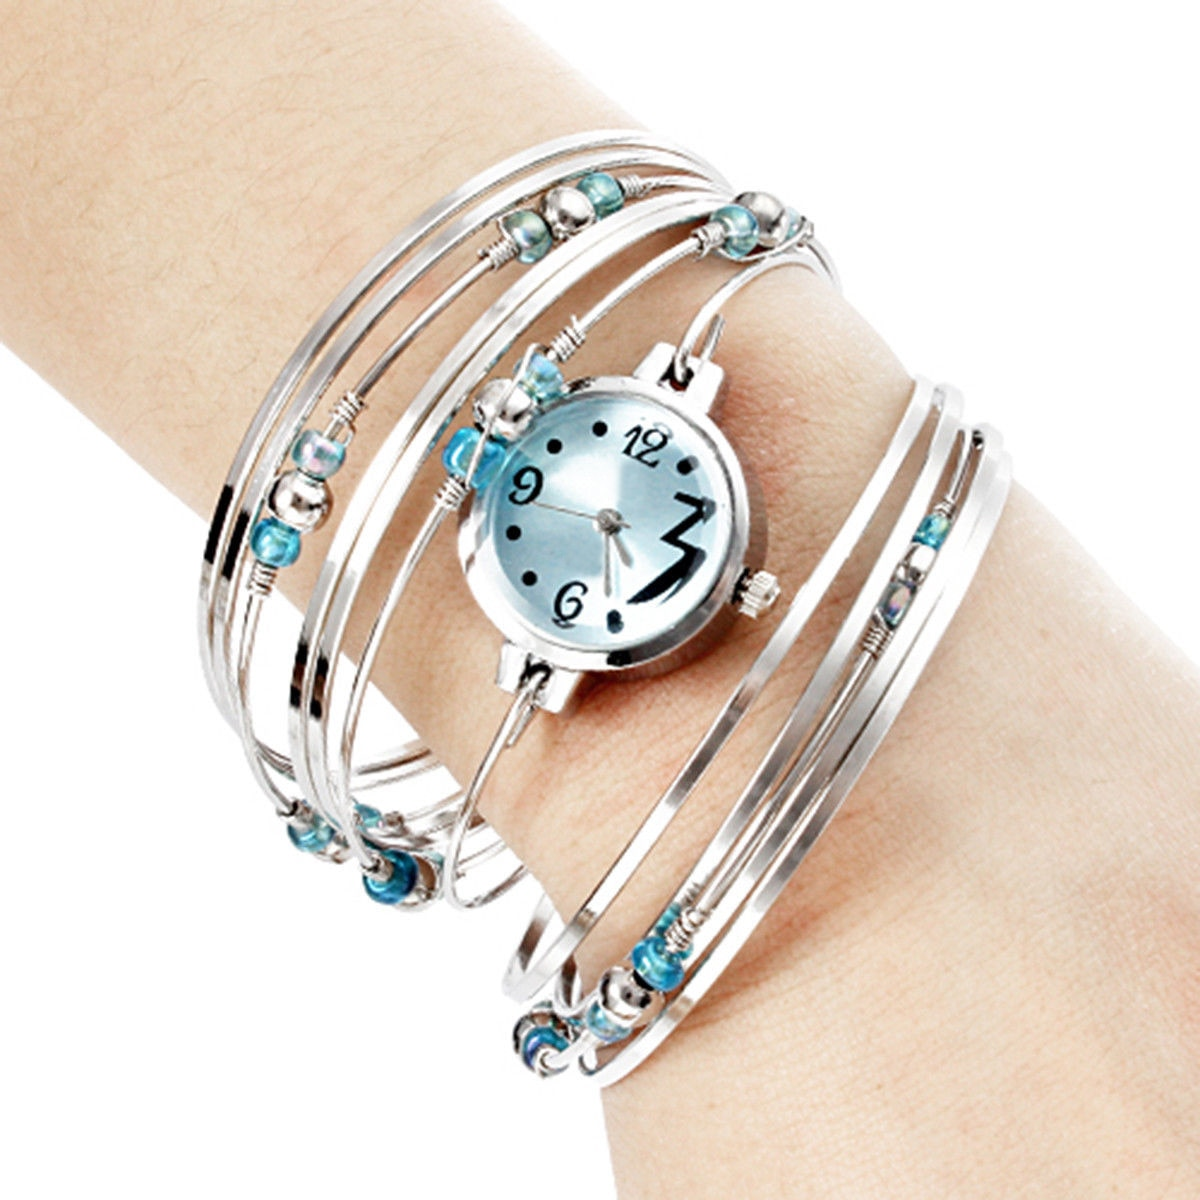 Wholesale Women's Silver Steel with Beads Quartz Analog Bracelet Watch Blue